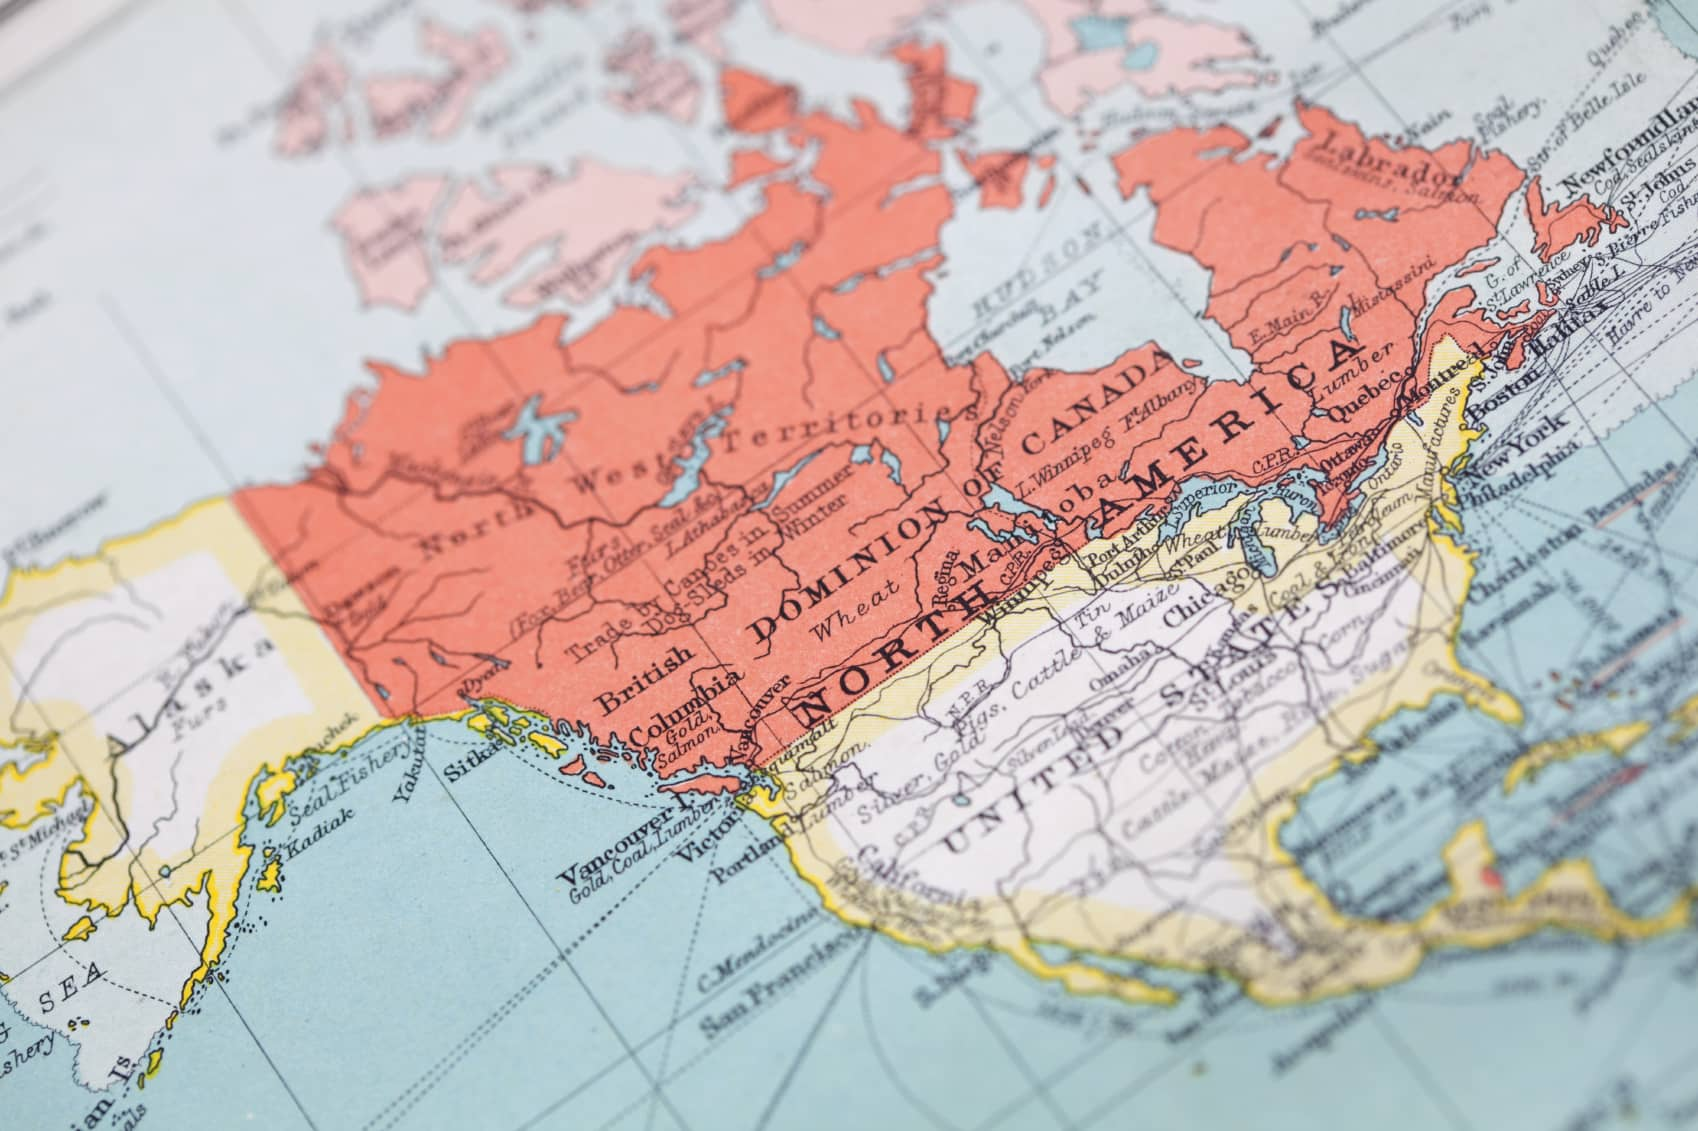 iStock_000012215448_Medium3 Report: North America Leads Growing Microgrid Sector